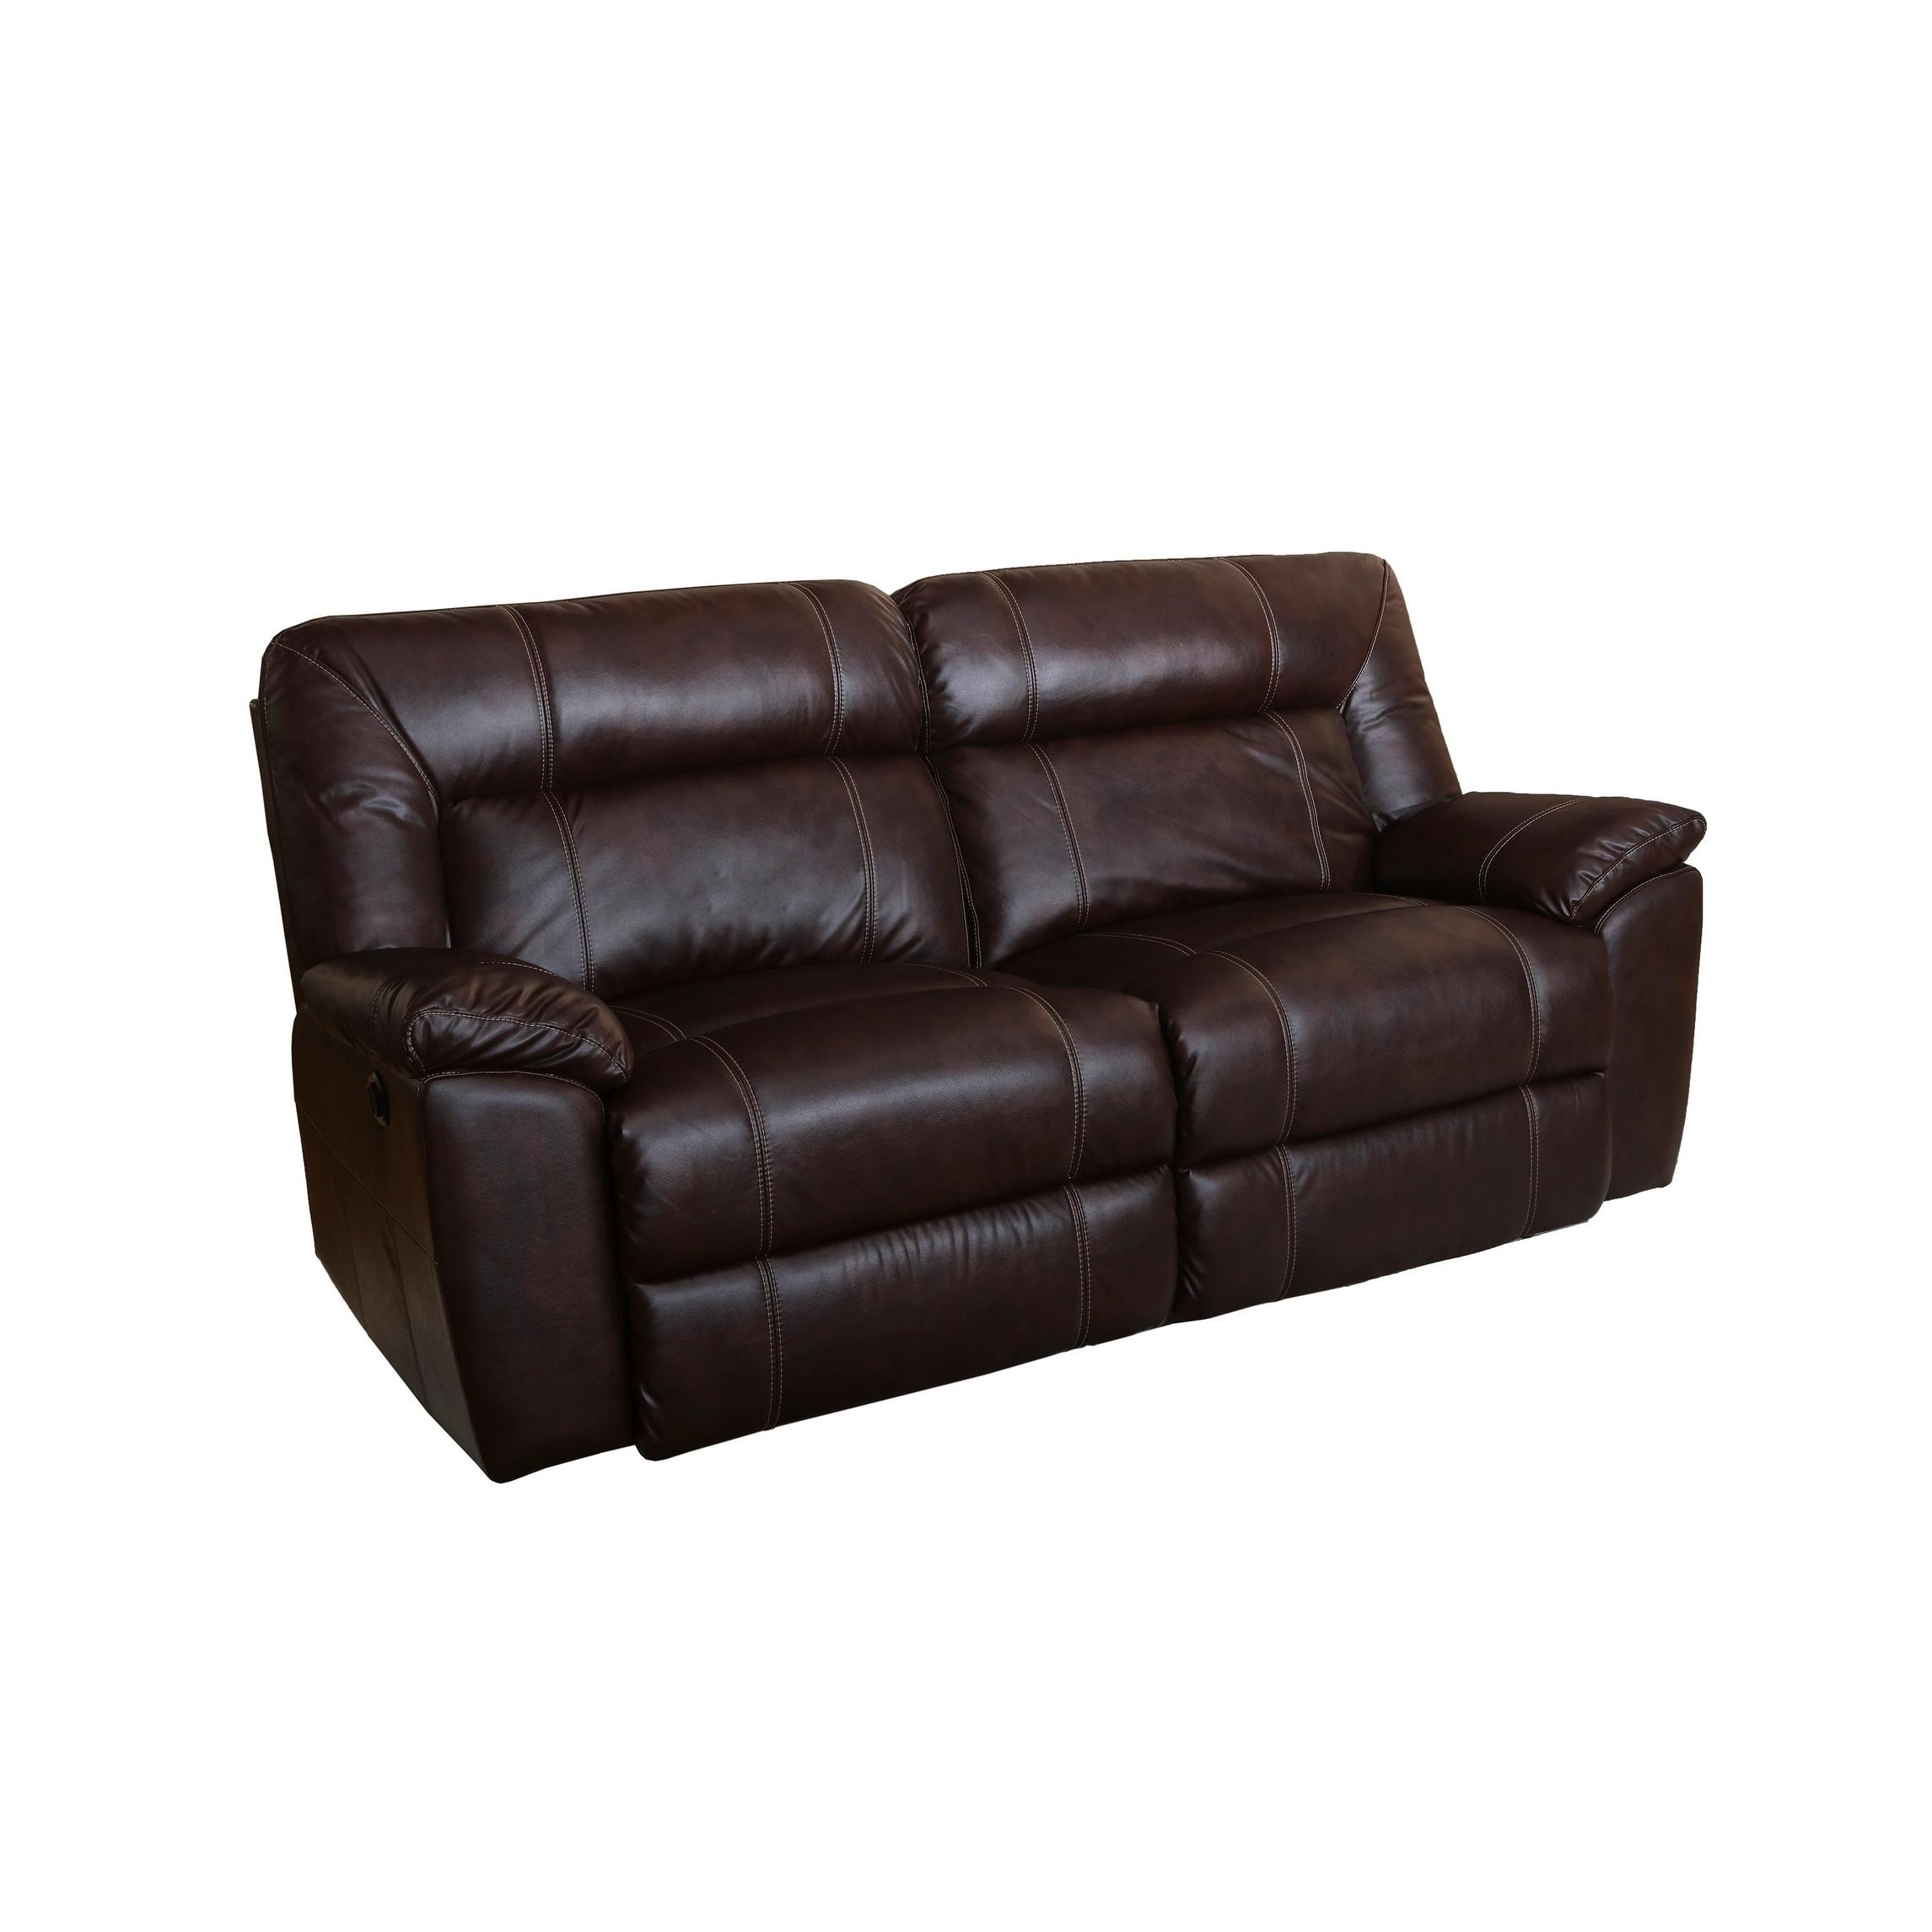 Brilliant Thornton Durham Brown Power Motion Dual Recliner Sofa Andrewgaddart Wooden Chair Designs For Living Room Andrewgaddartcom